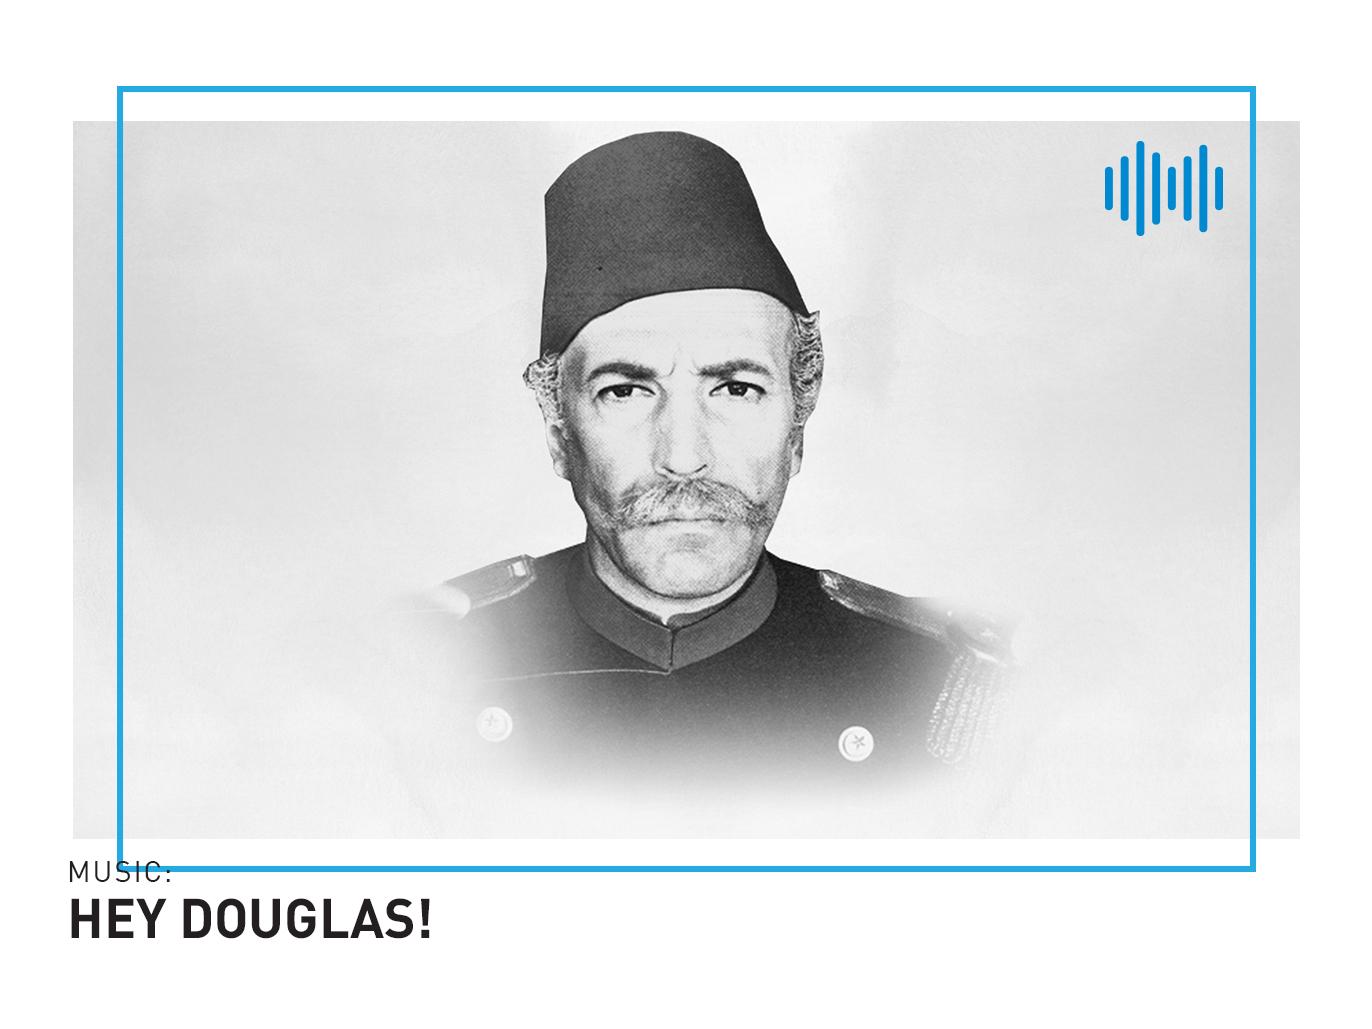 Hey Douglas! - Adidas